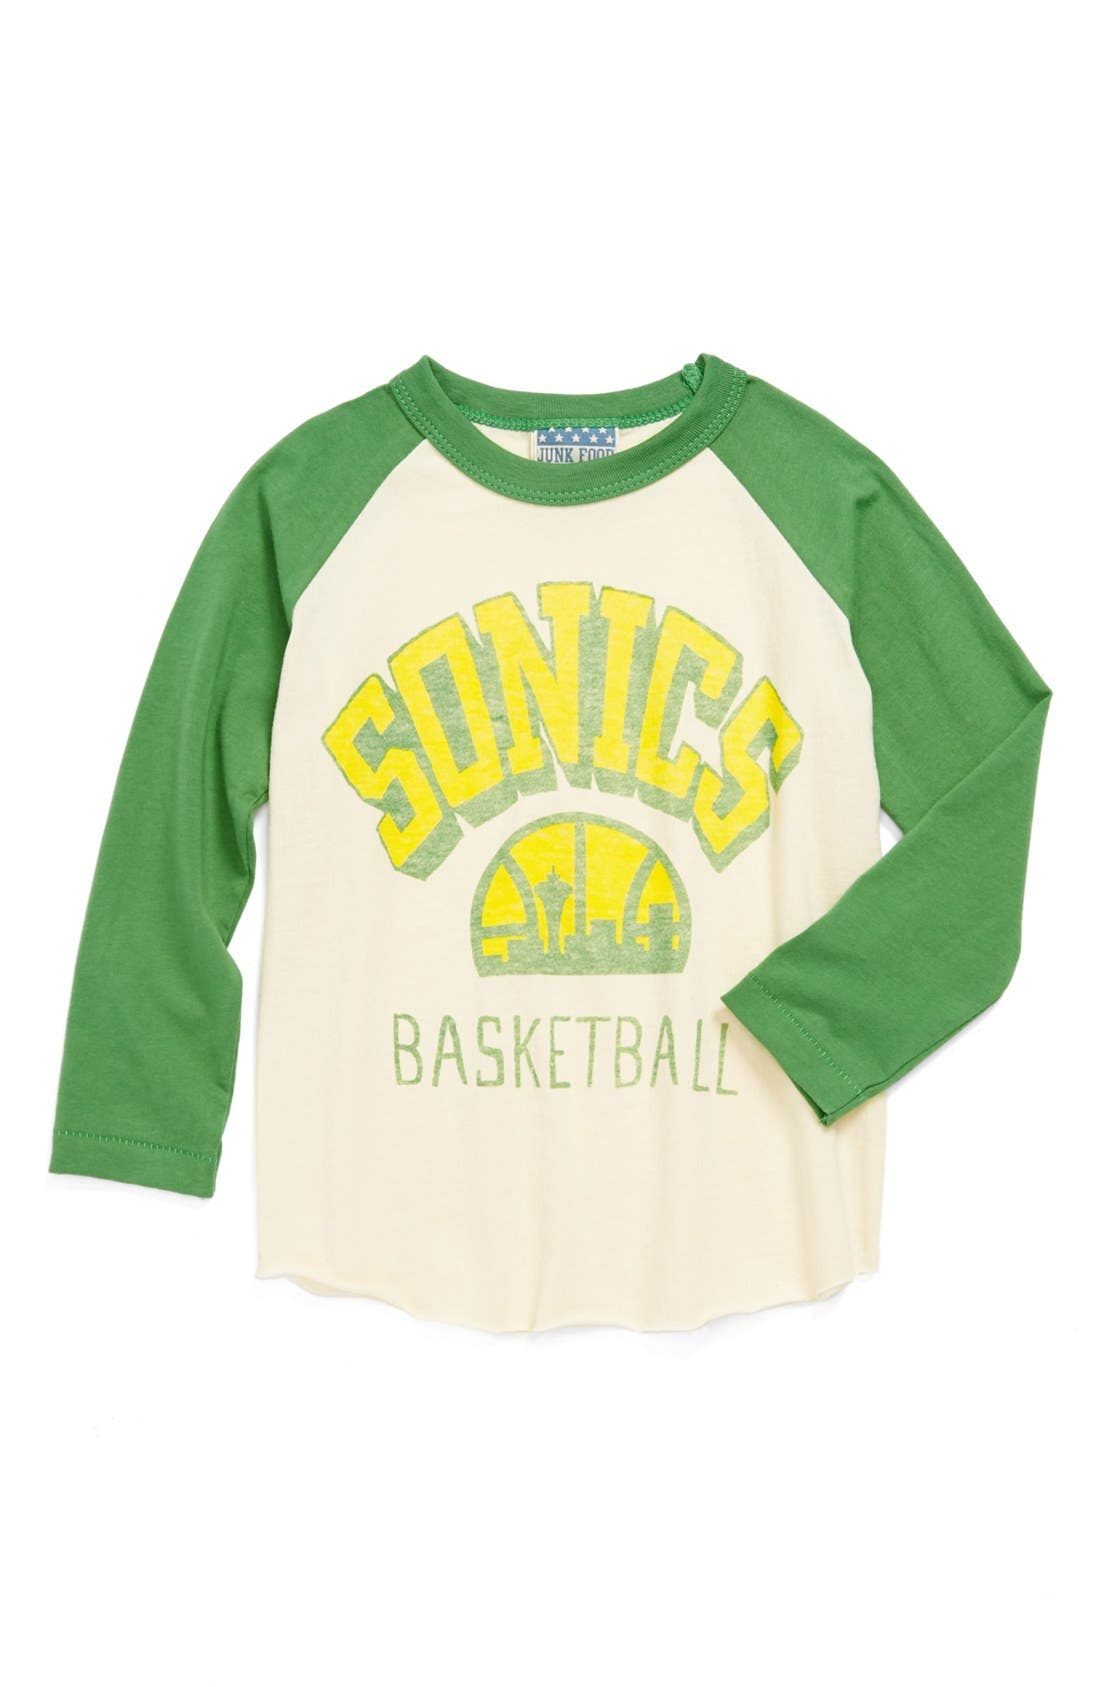 Alternate Image 1 Selected - Junk Food 'Seattle Sonics' Long Sleeve T-Shirt (Little Boys & Big Boys)